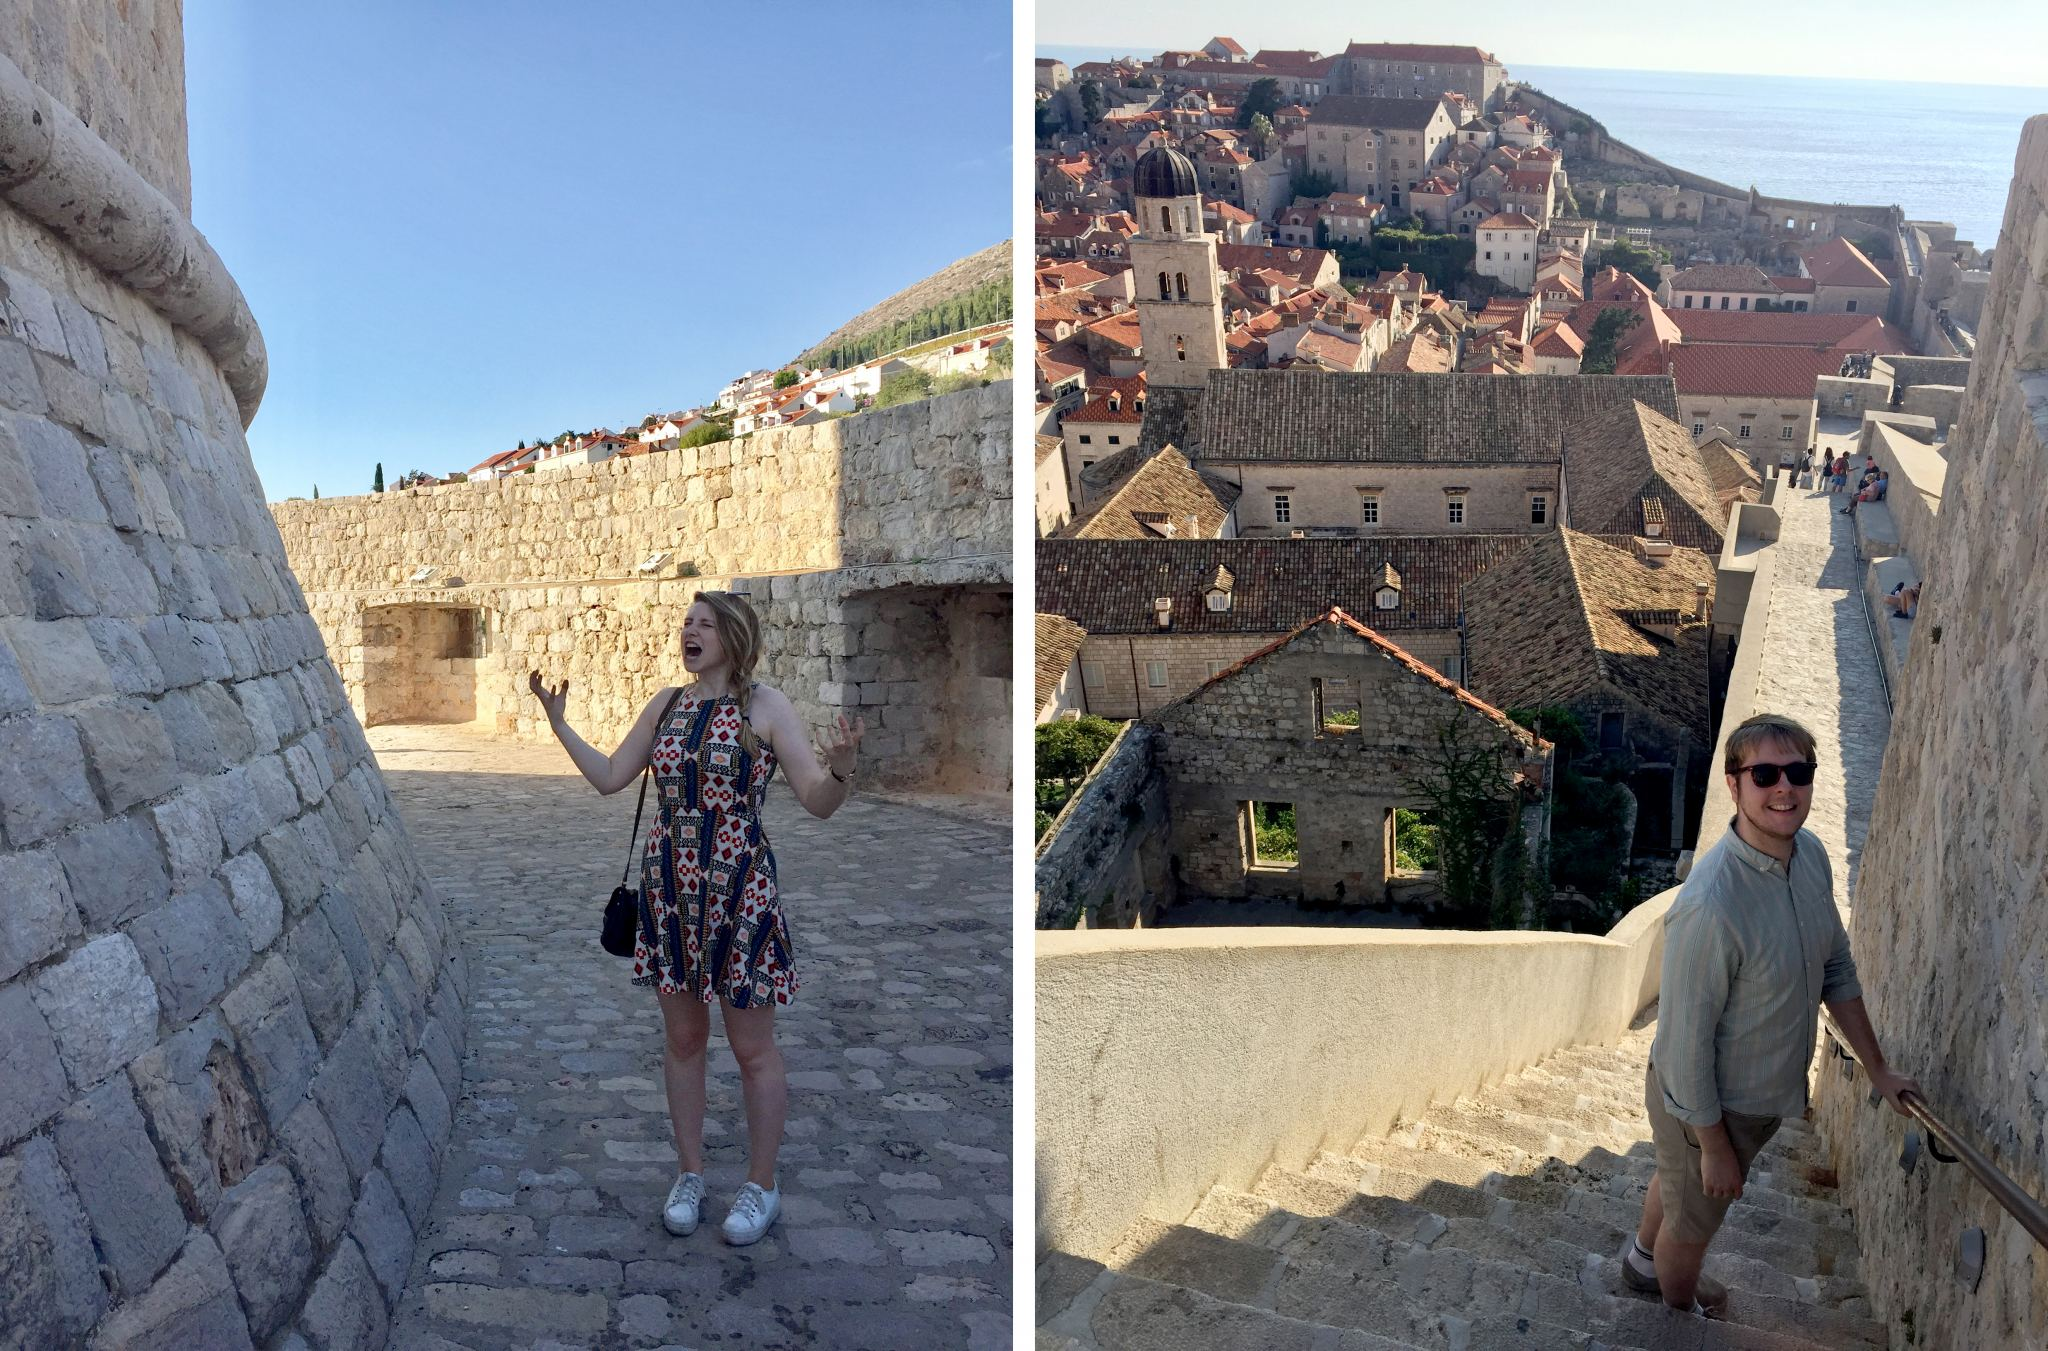 Minčeta Tower, Dubrovnik